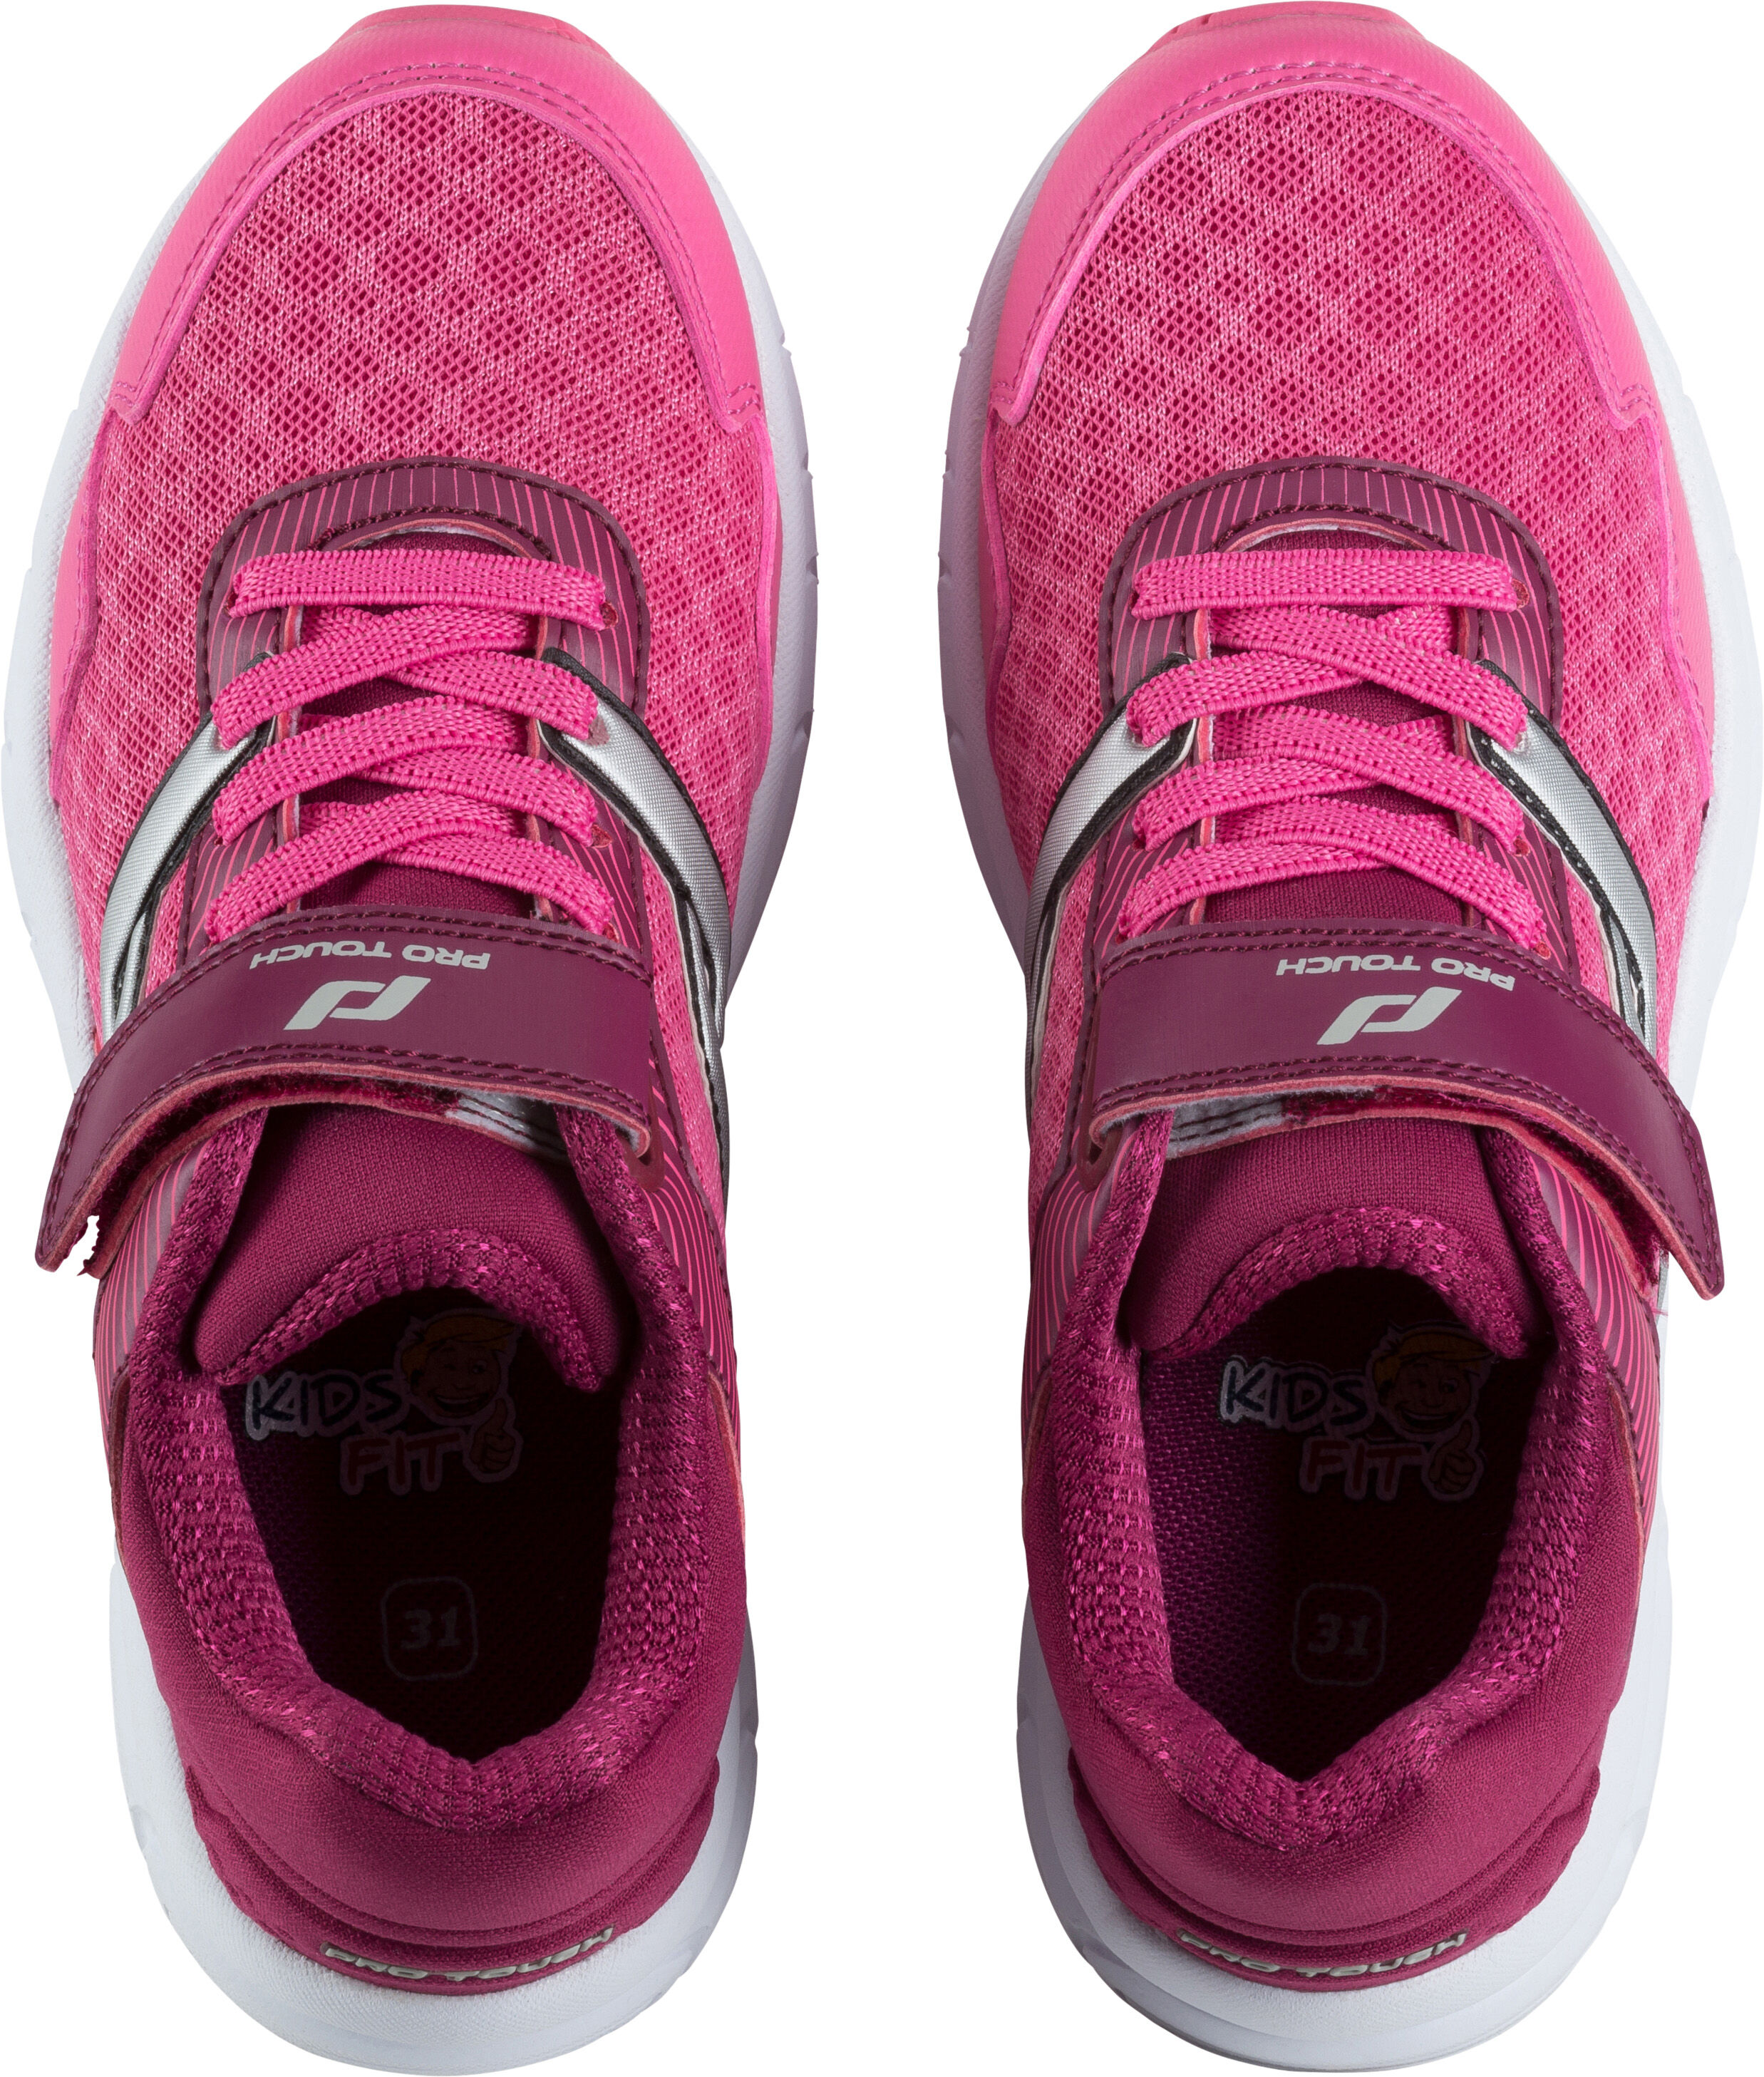 PRO TOUCH | Elexir 9 løpesko dame | Løpesko | Rød